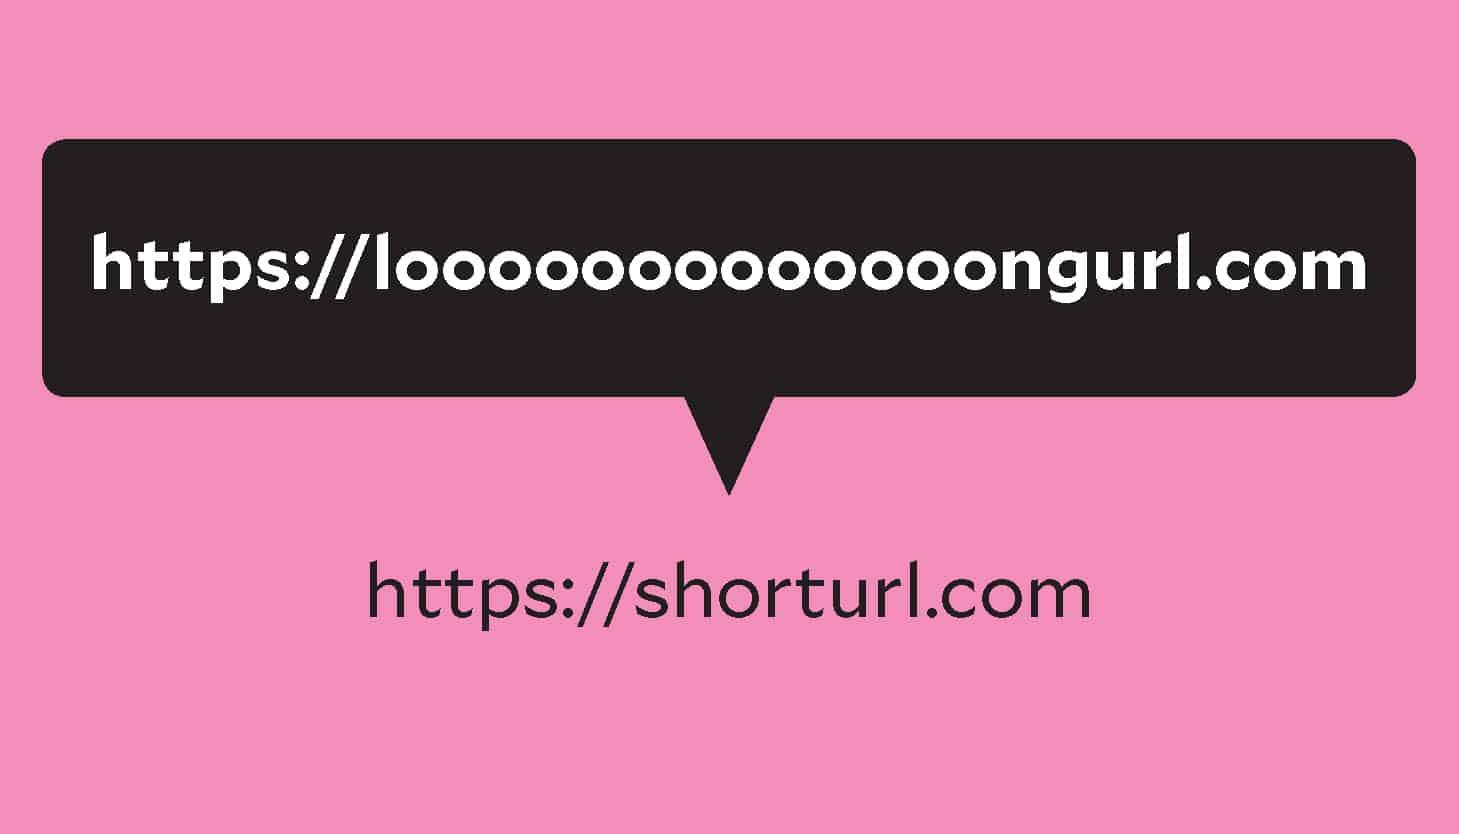 A long URL shortened to a shorter URL